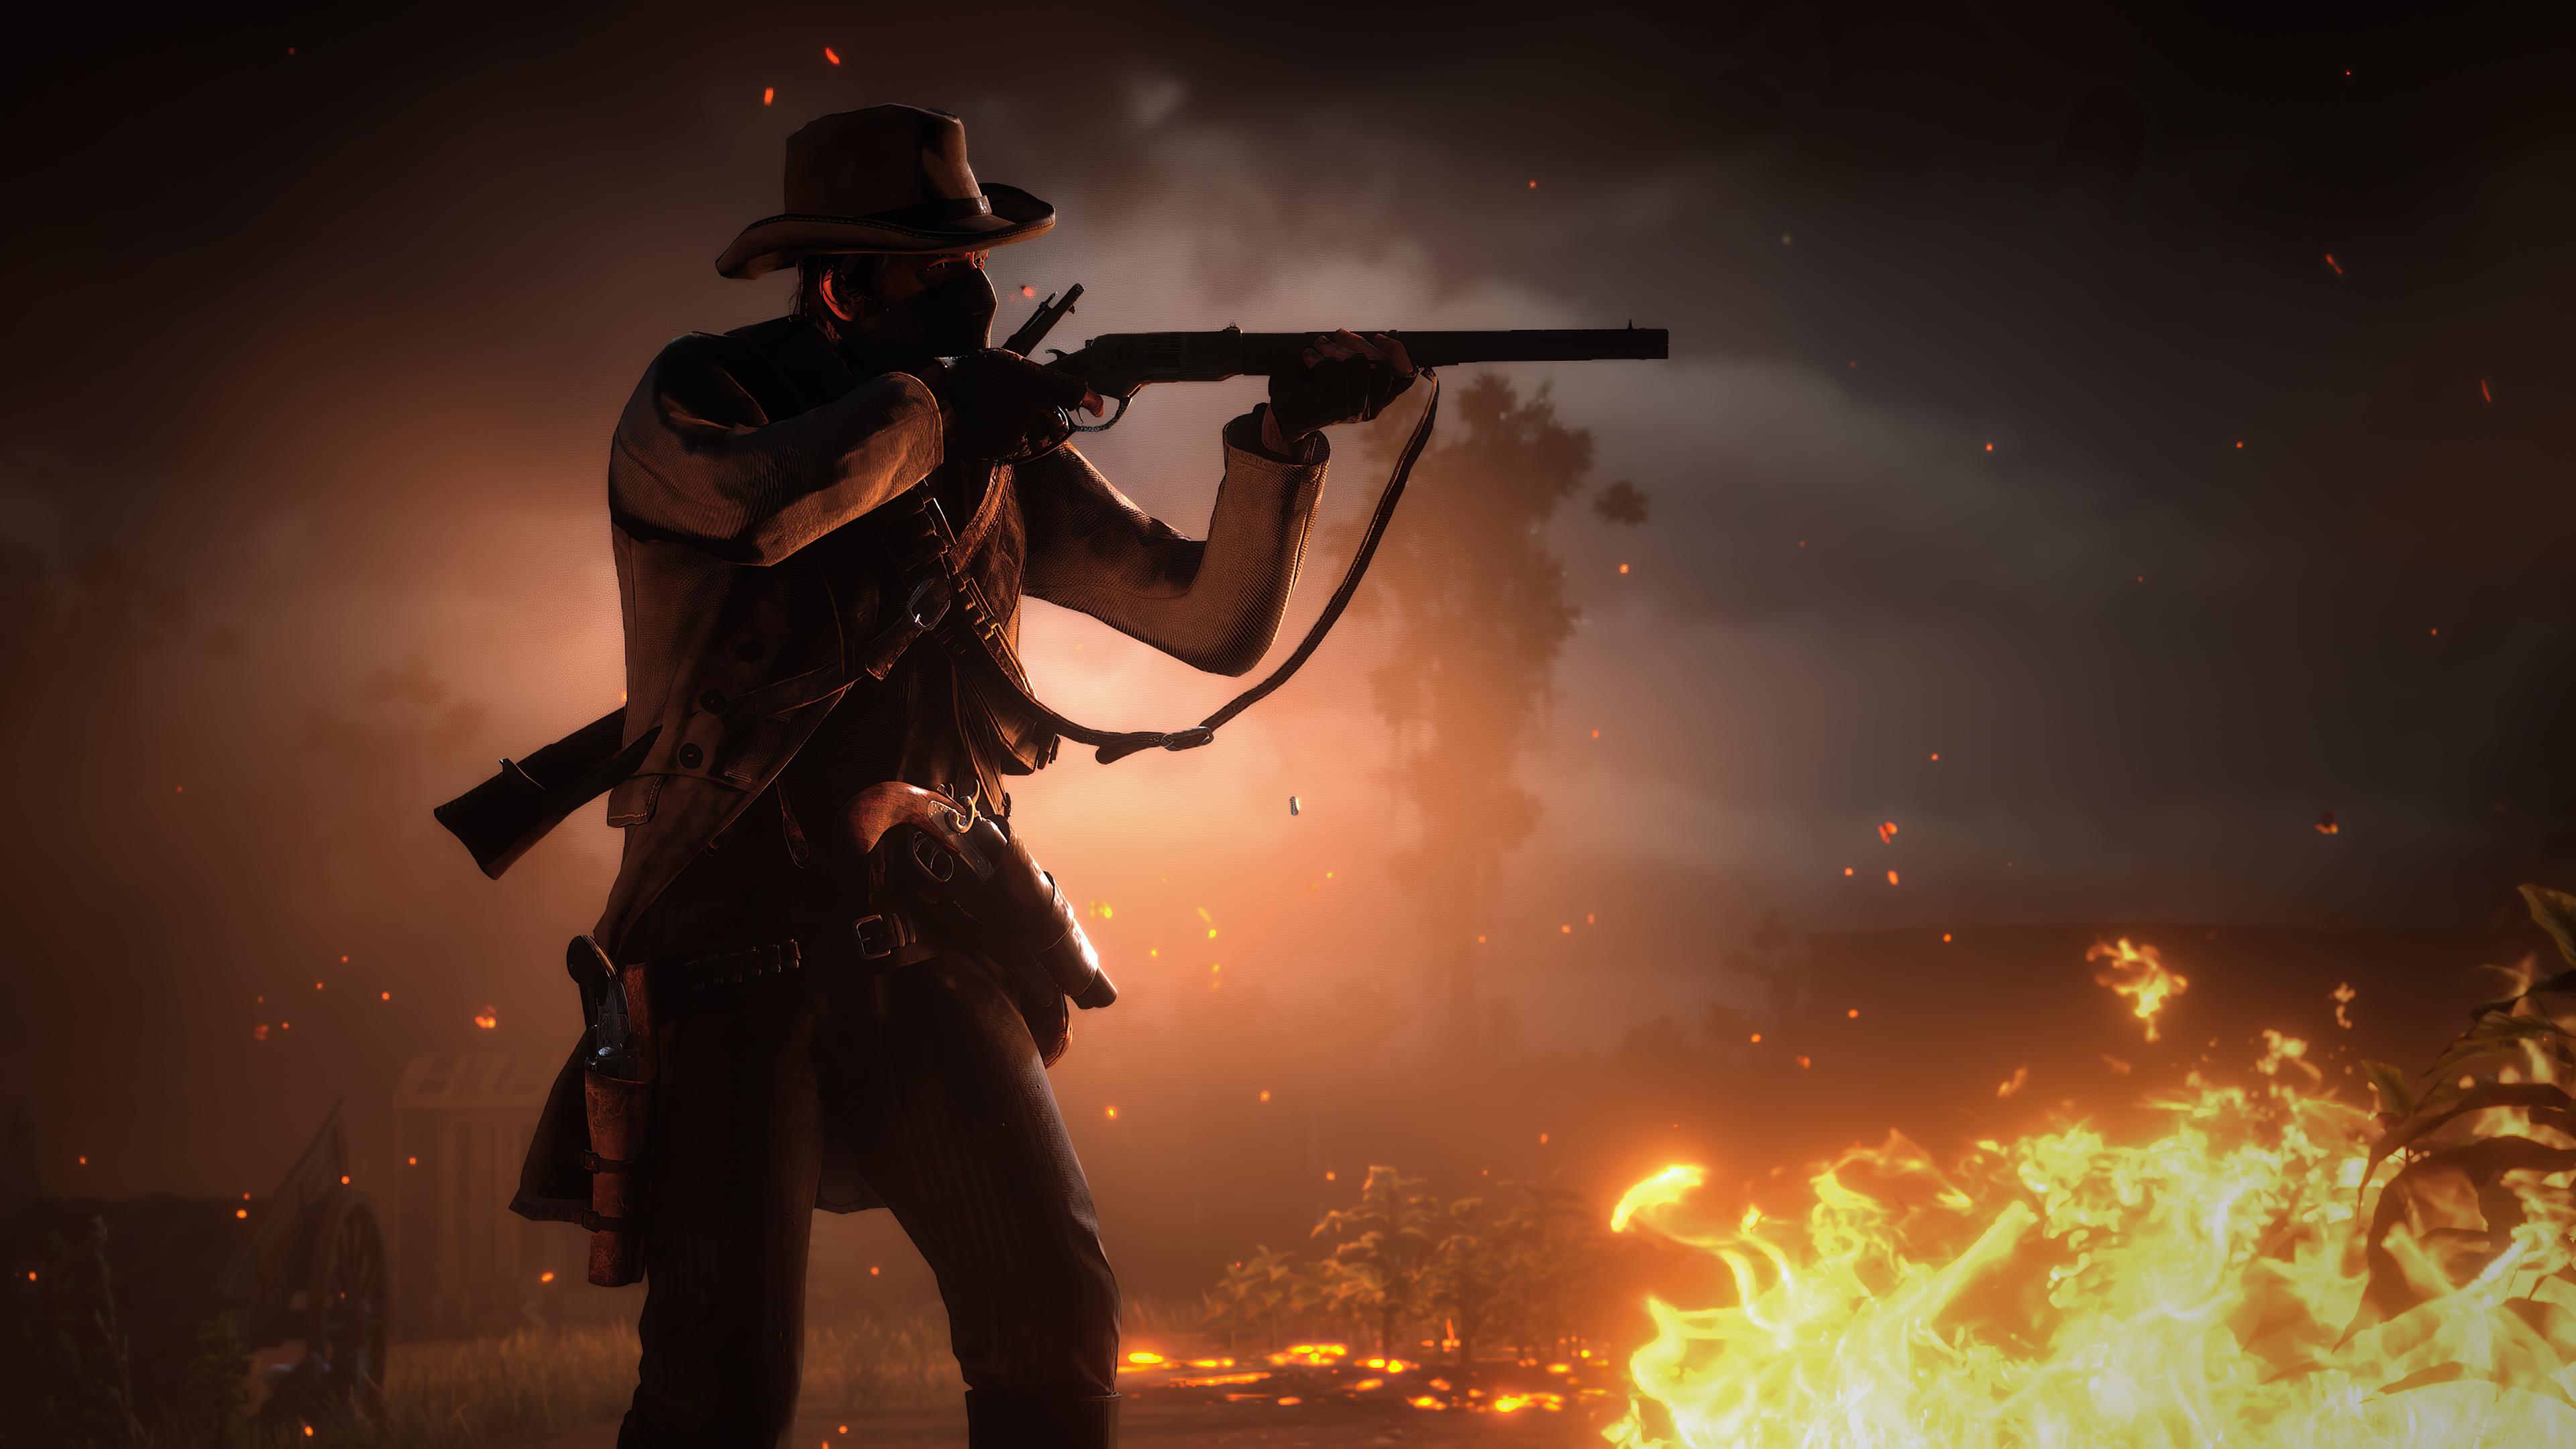 red dead redemption ii 4k 1604867609 - Red Dead Redemption II 4k - Red Dead Redemption II 4k wallpapers